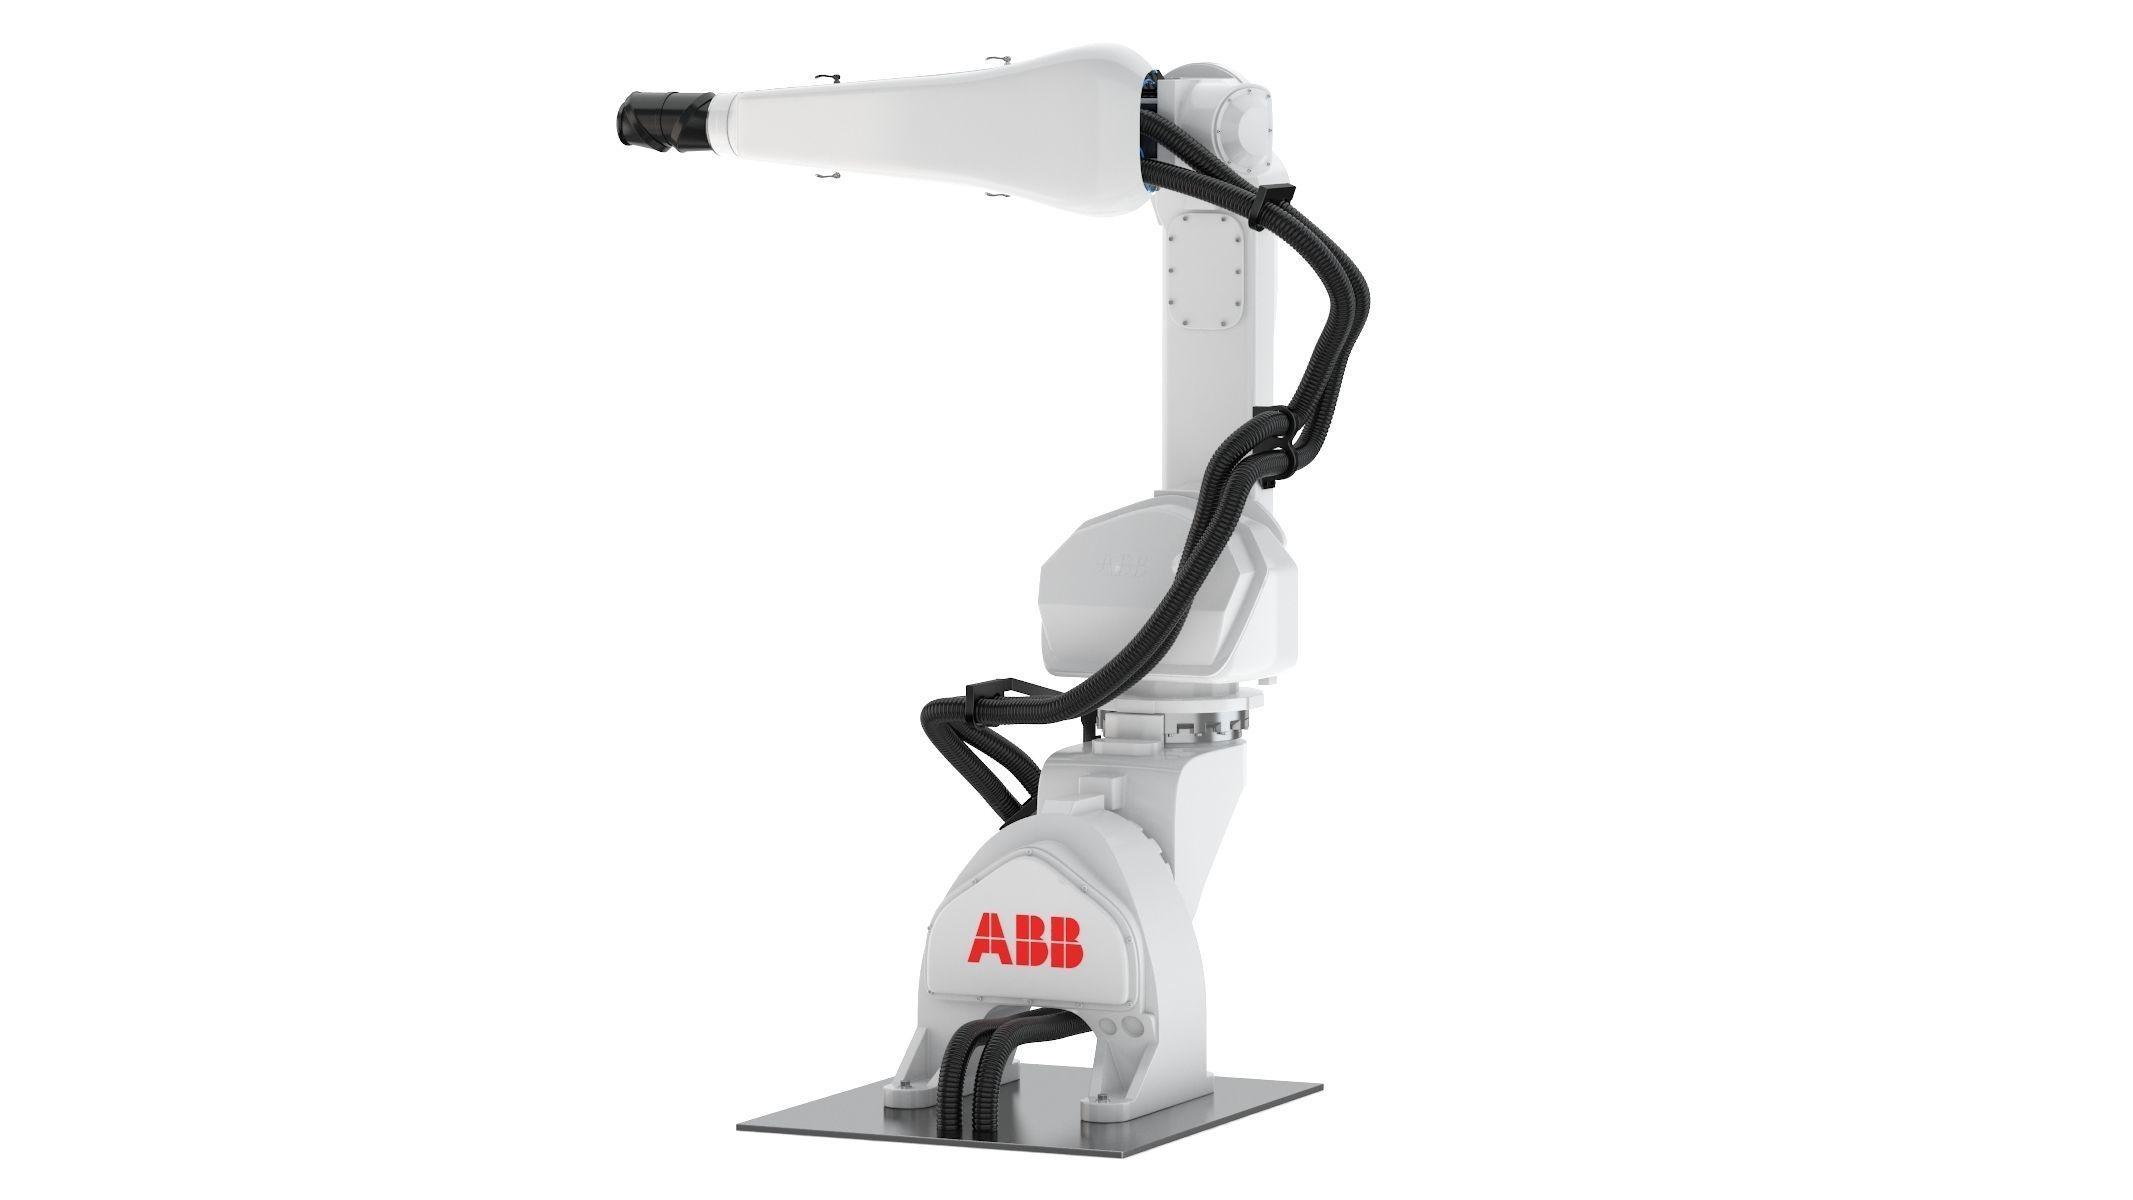 ABB IRB 5500-27 Compact Paint Robot